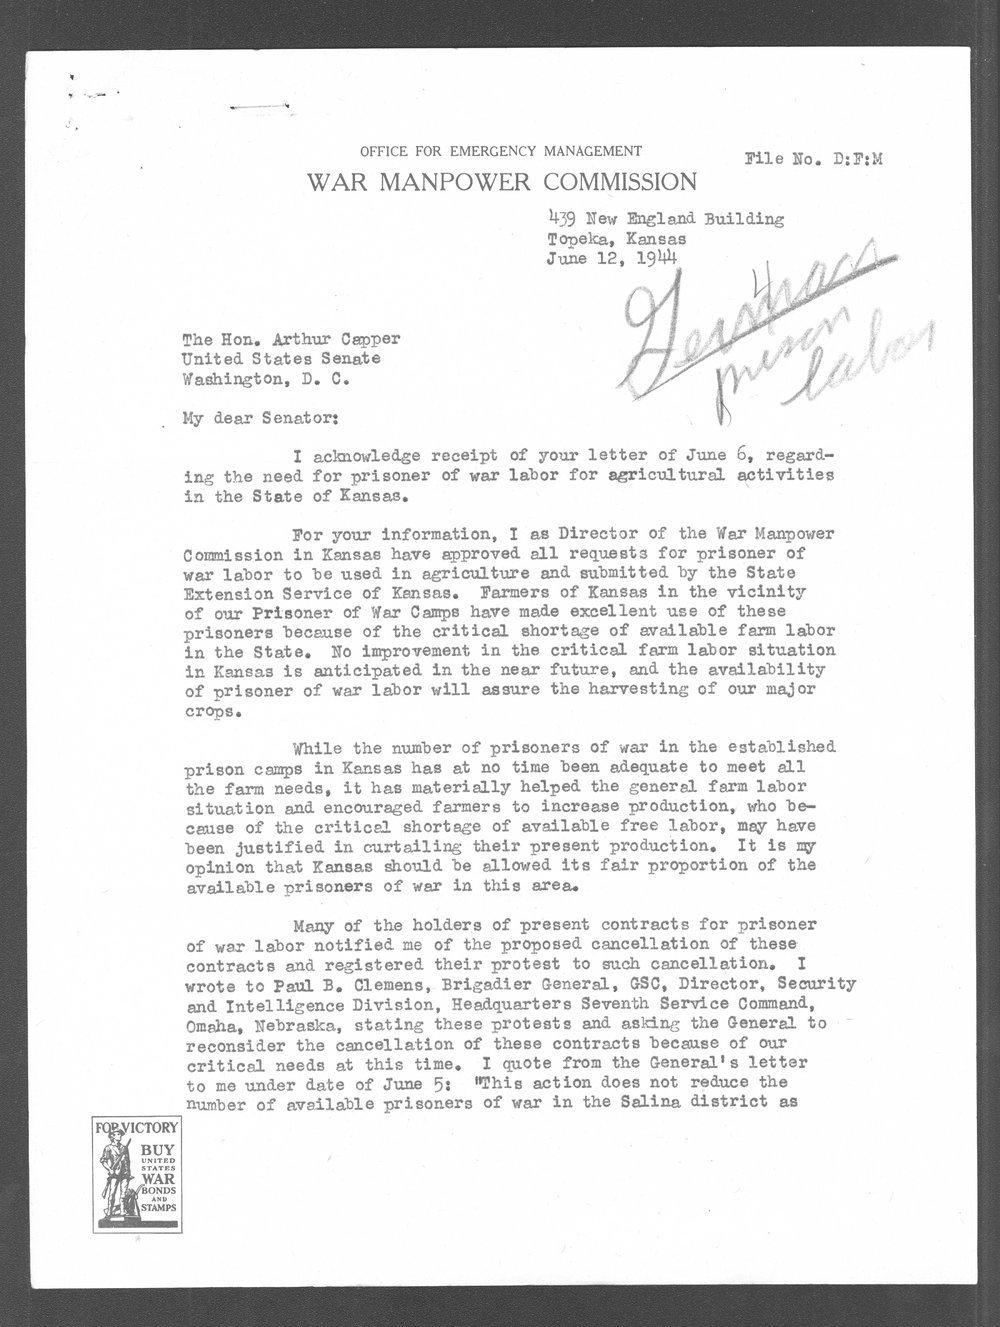 Edward Franzke to Senator Arthur Capper - 1